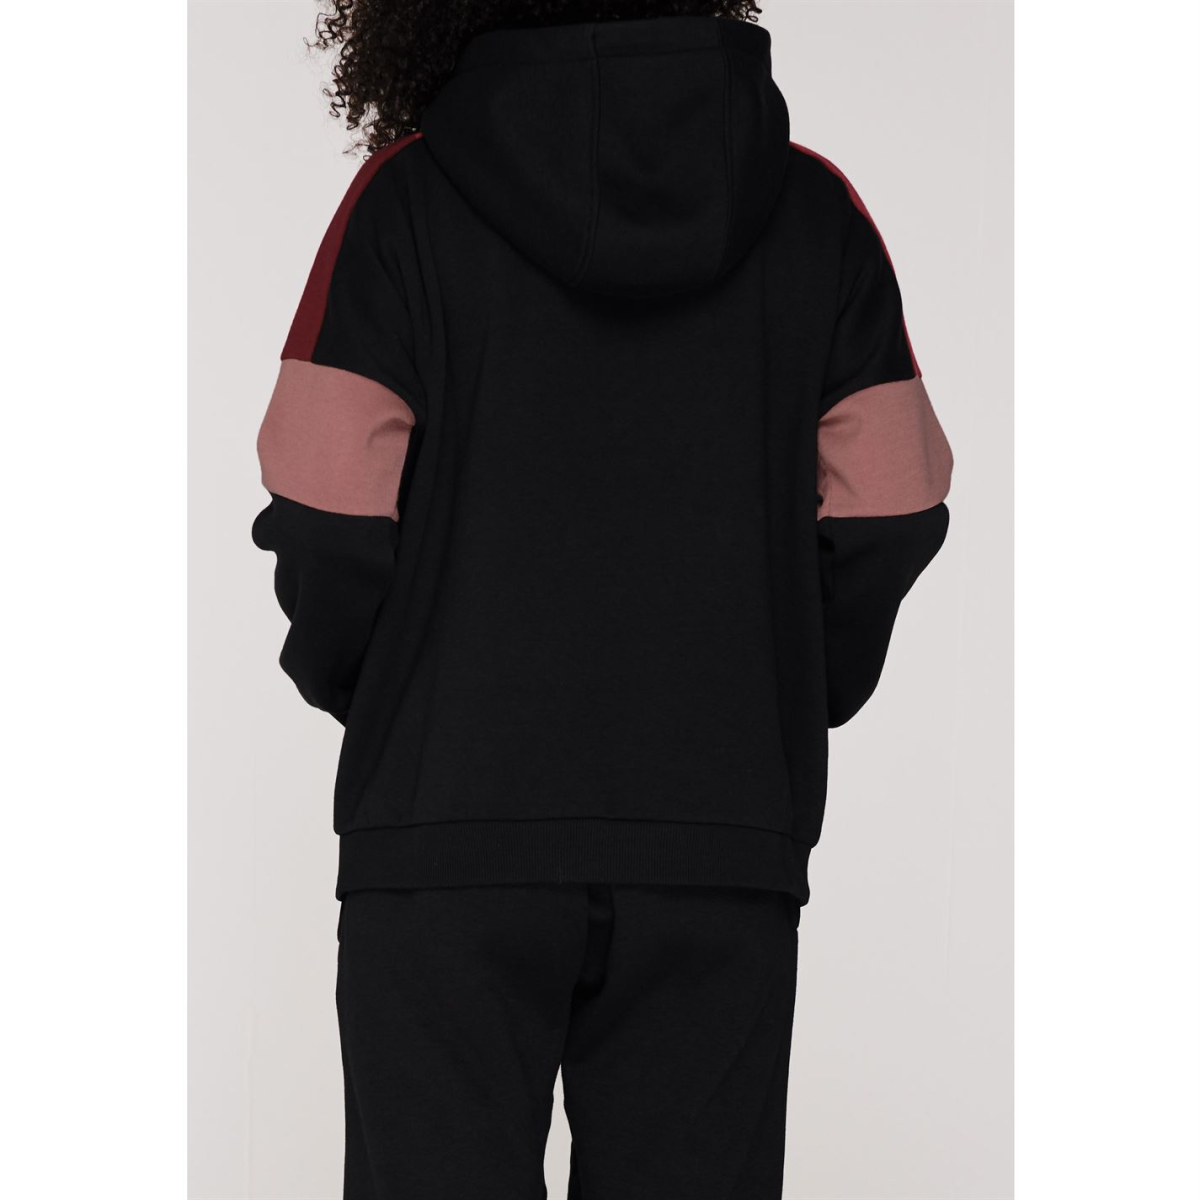 Everlast Kapuzenpullover Pullover Damen Sweatshirt Kapuzenjacke Jacke 4321